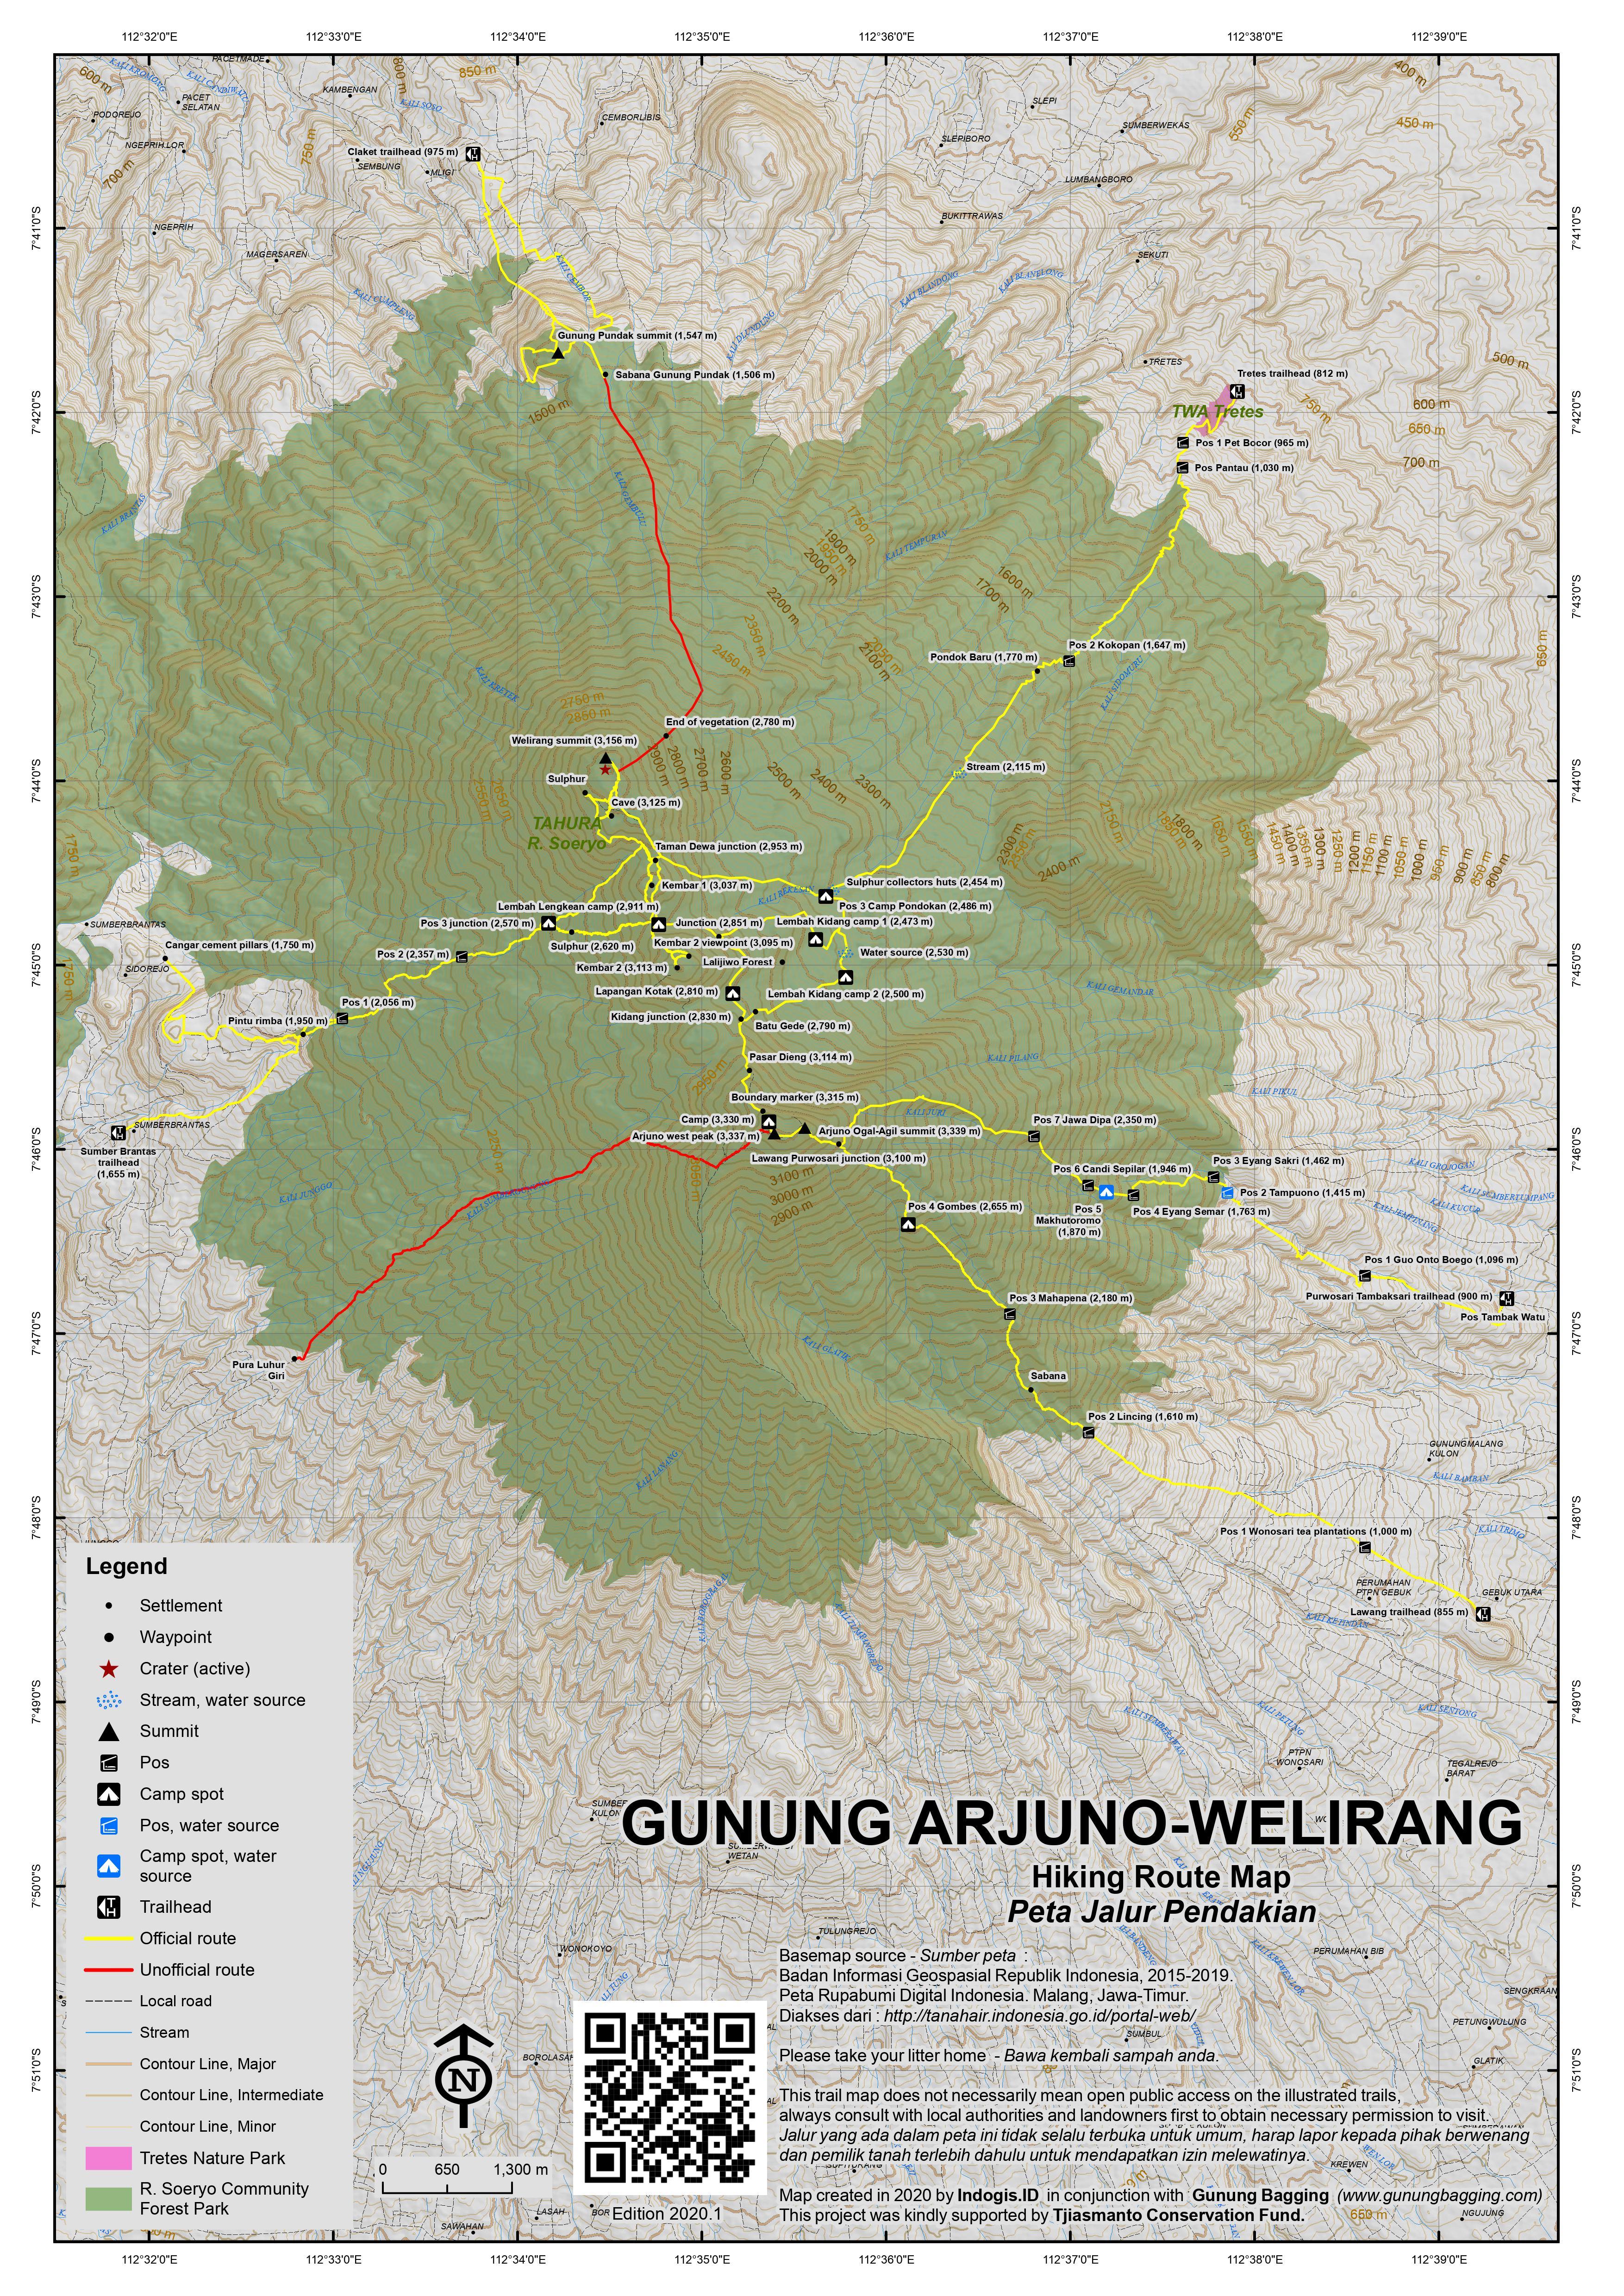 Peta Jalur Pendakian Gunung Arjuno-Welirang